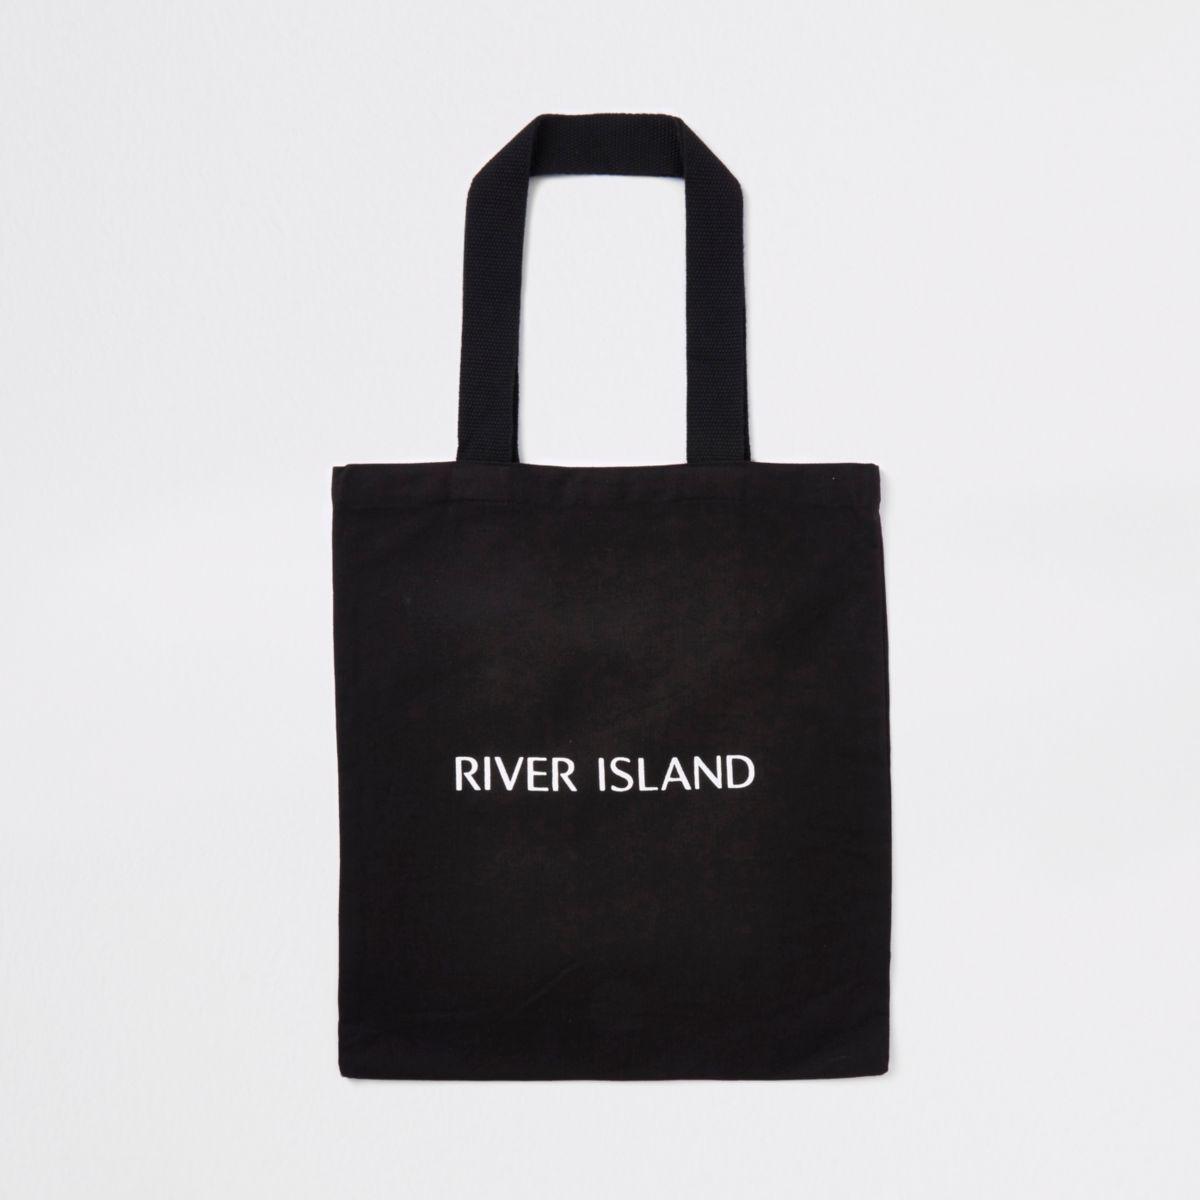 RI – Schwarze Shopper-Tasche